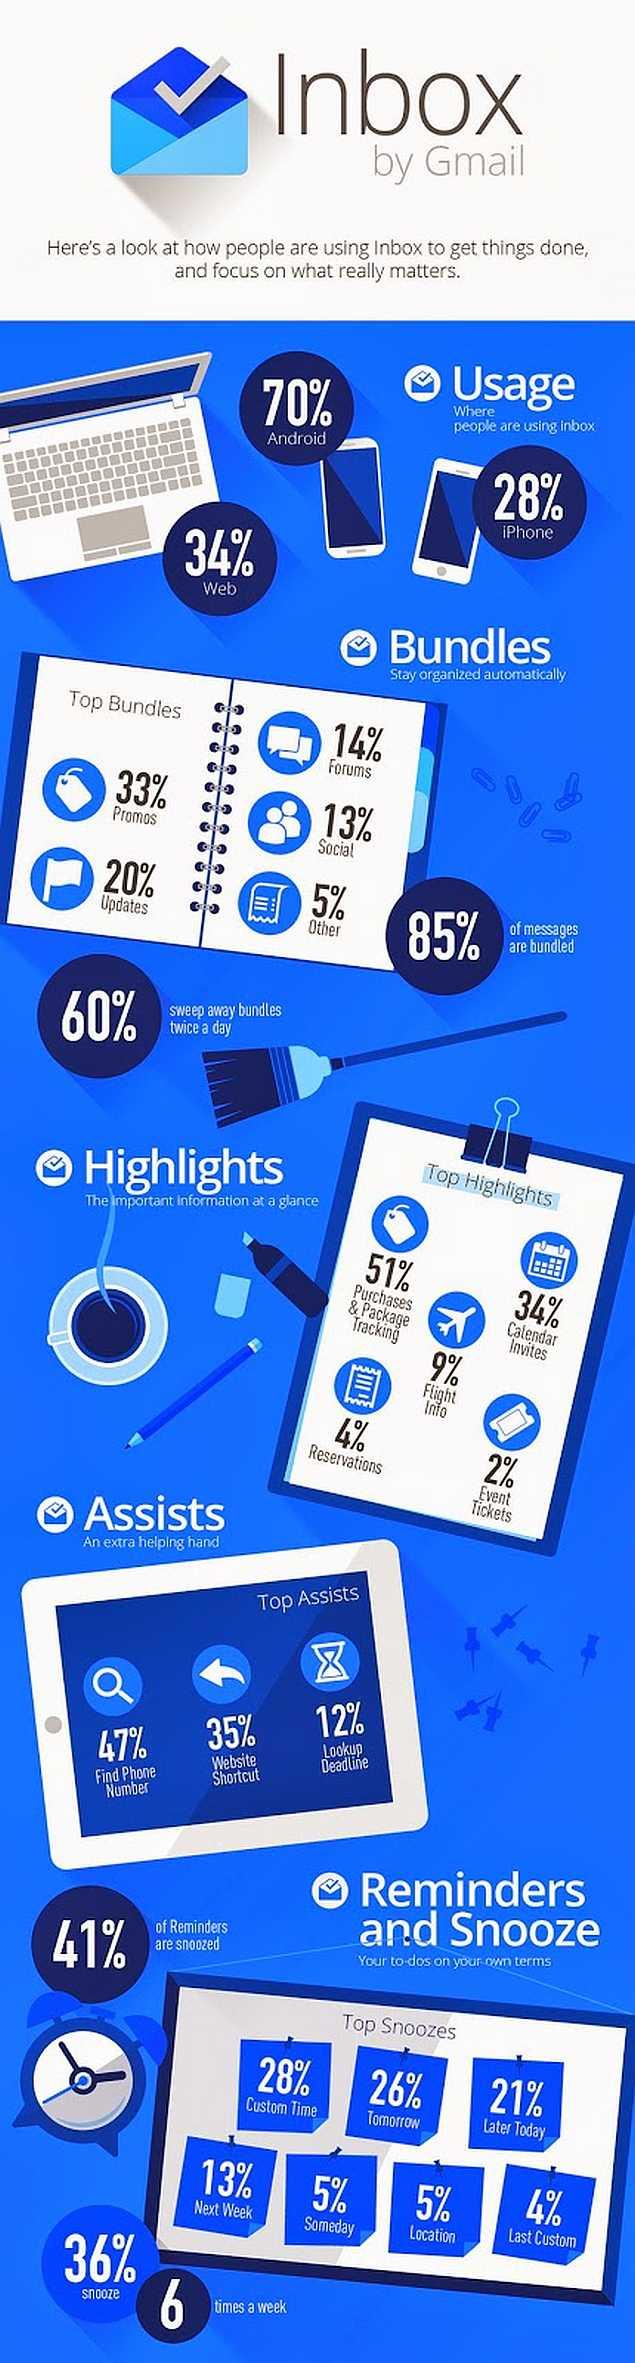 google_gmail_inbox_stats_infographic_blog.jpg